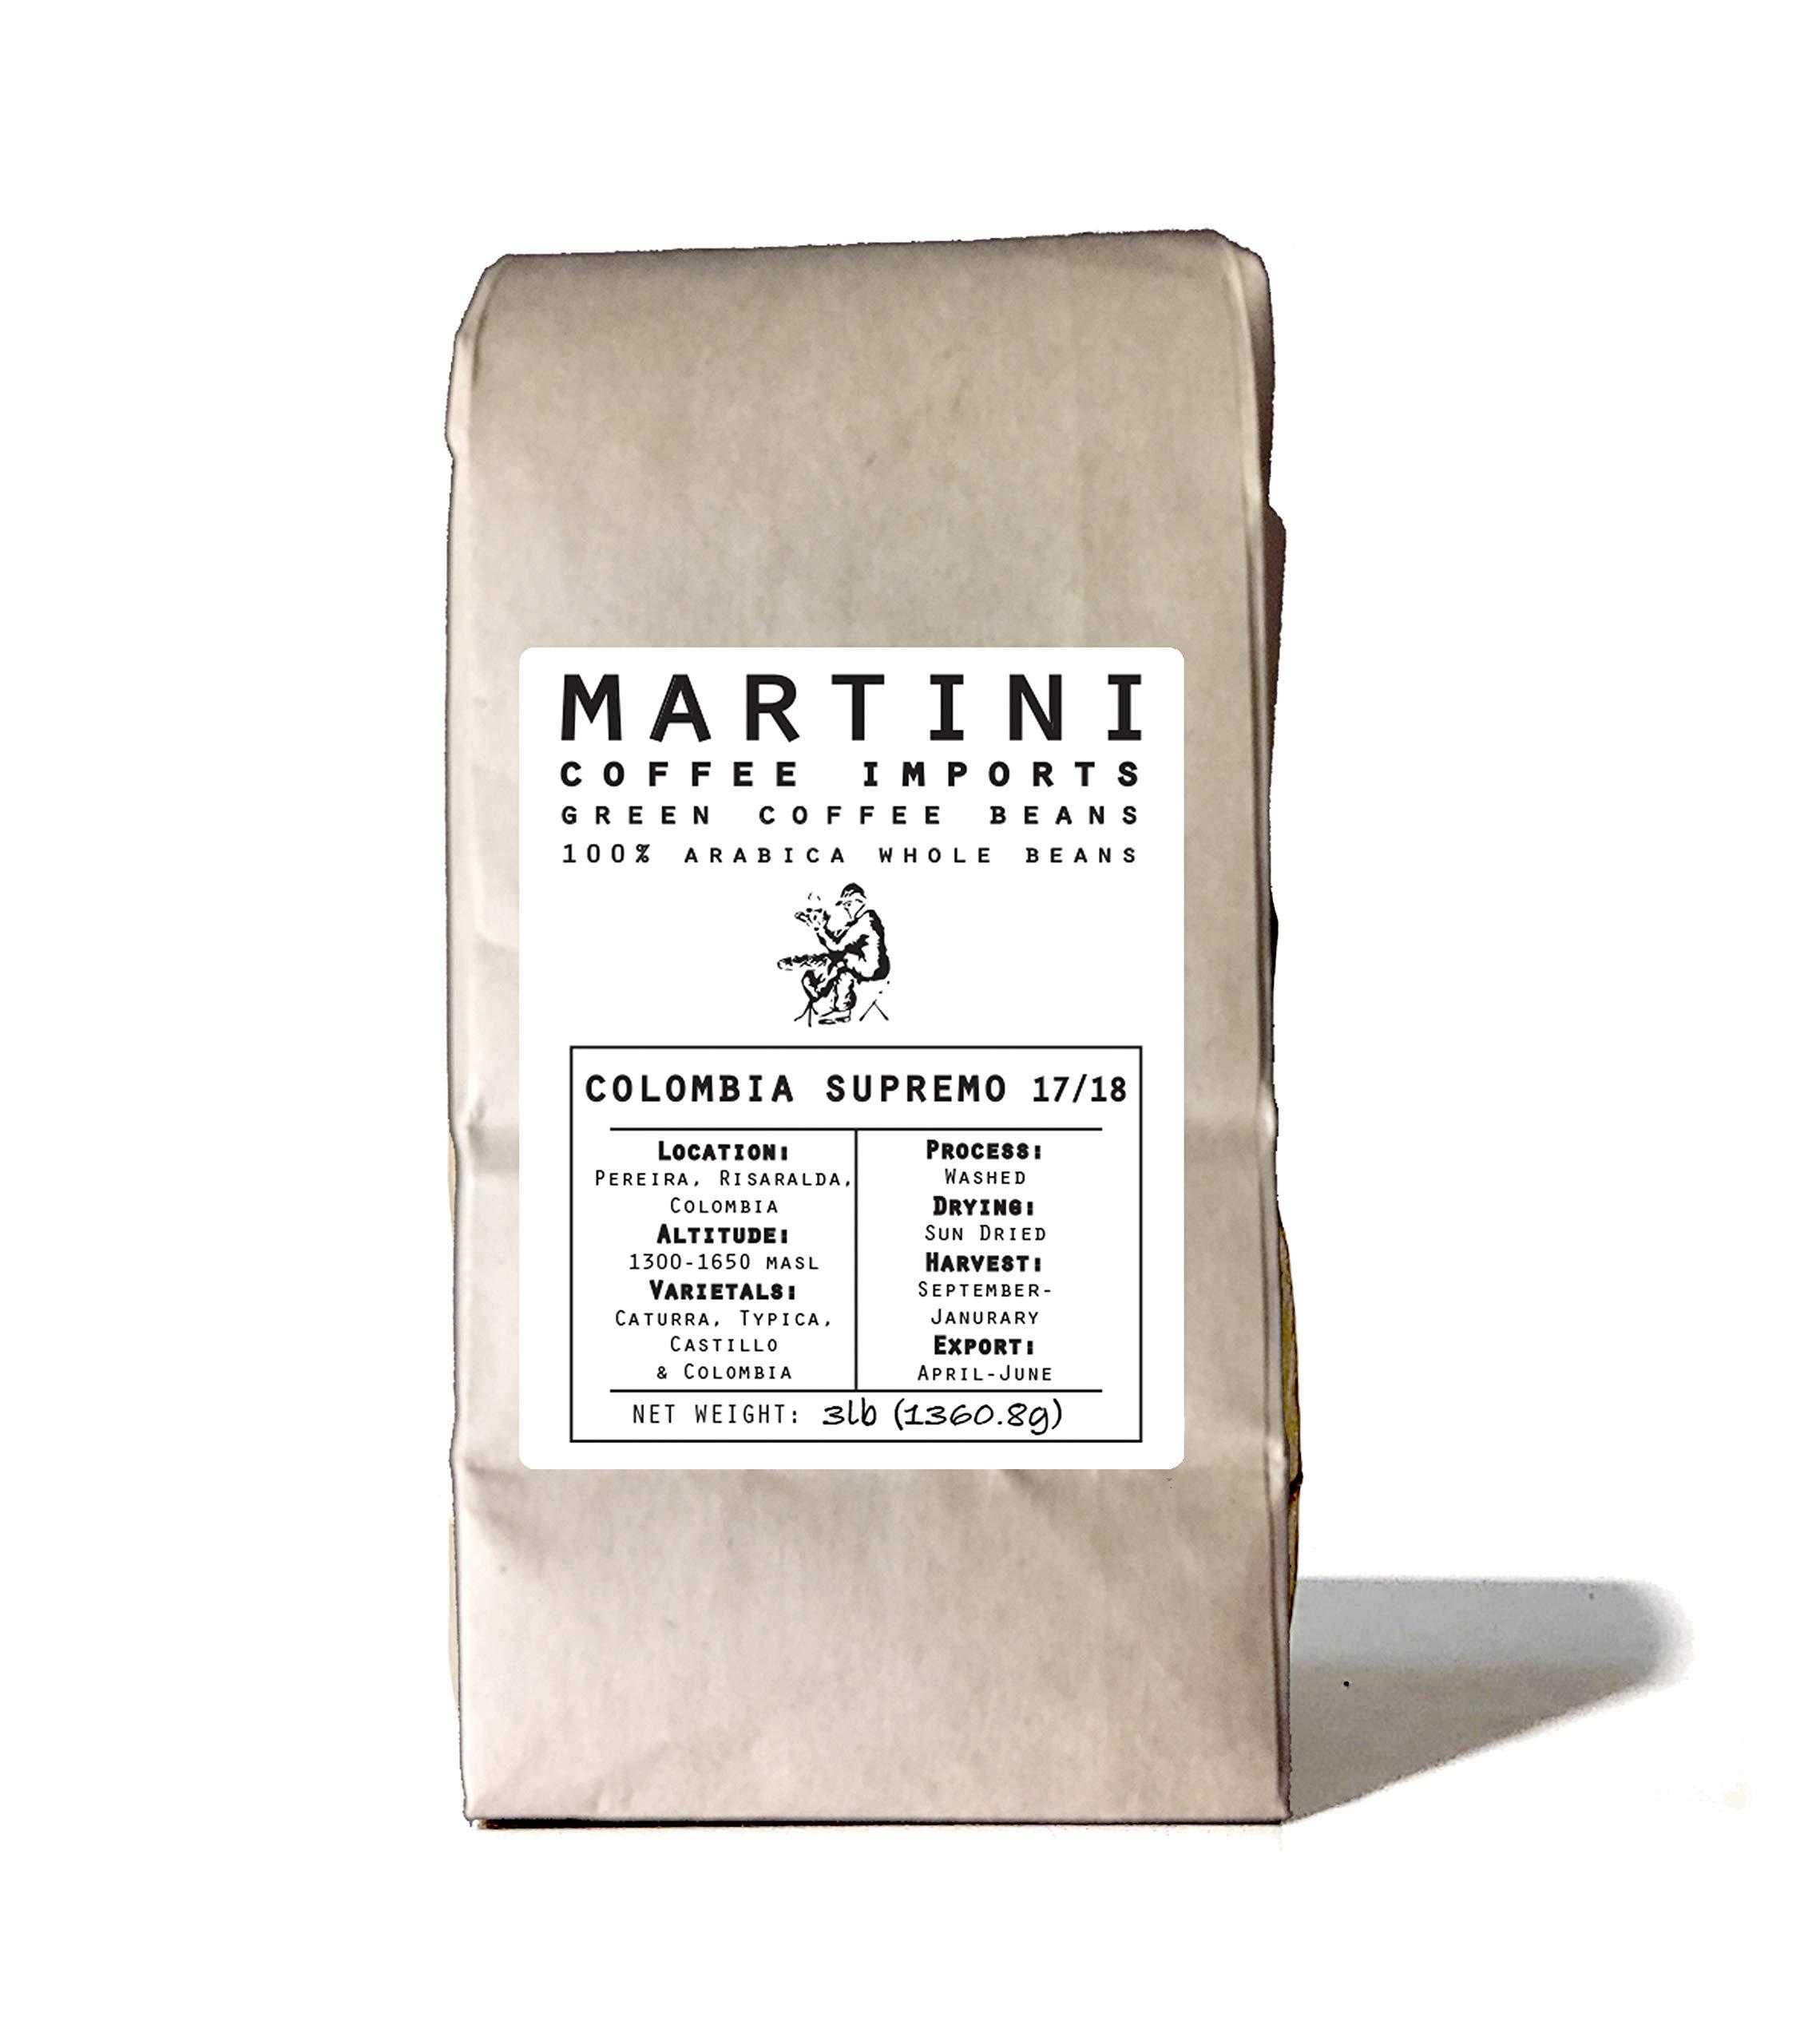 3Lbs, Single Origin Unroasted Green Coffee Beans, Colombia Supremo 17/18